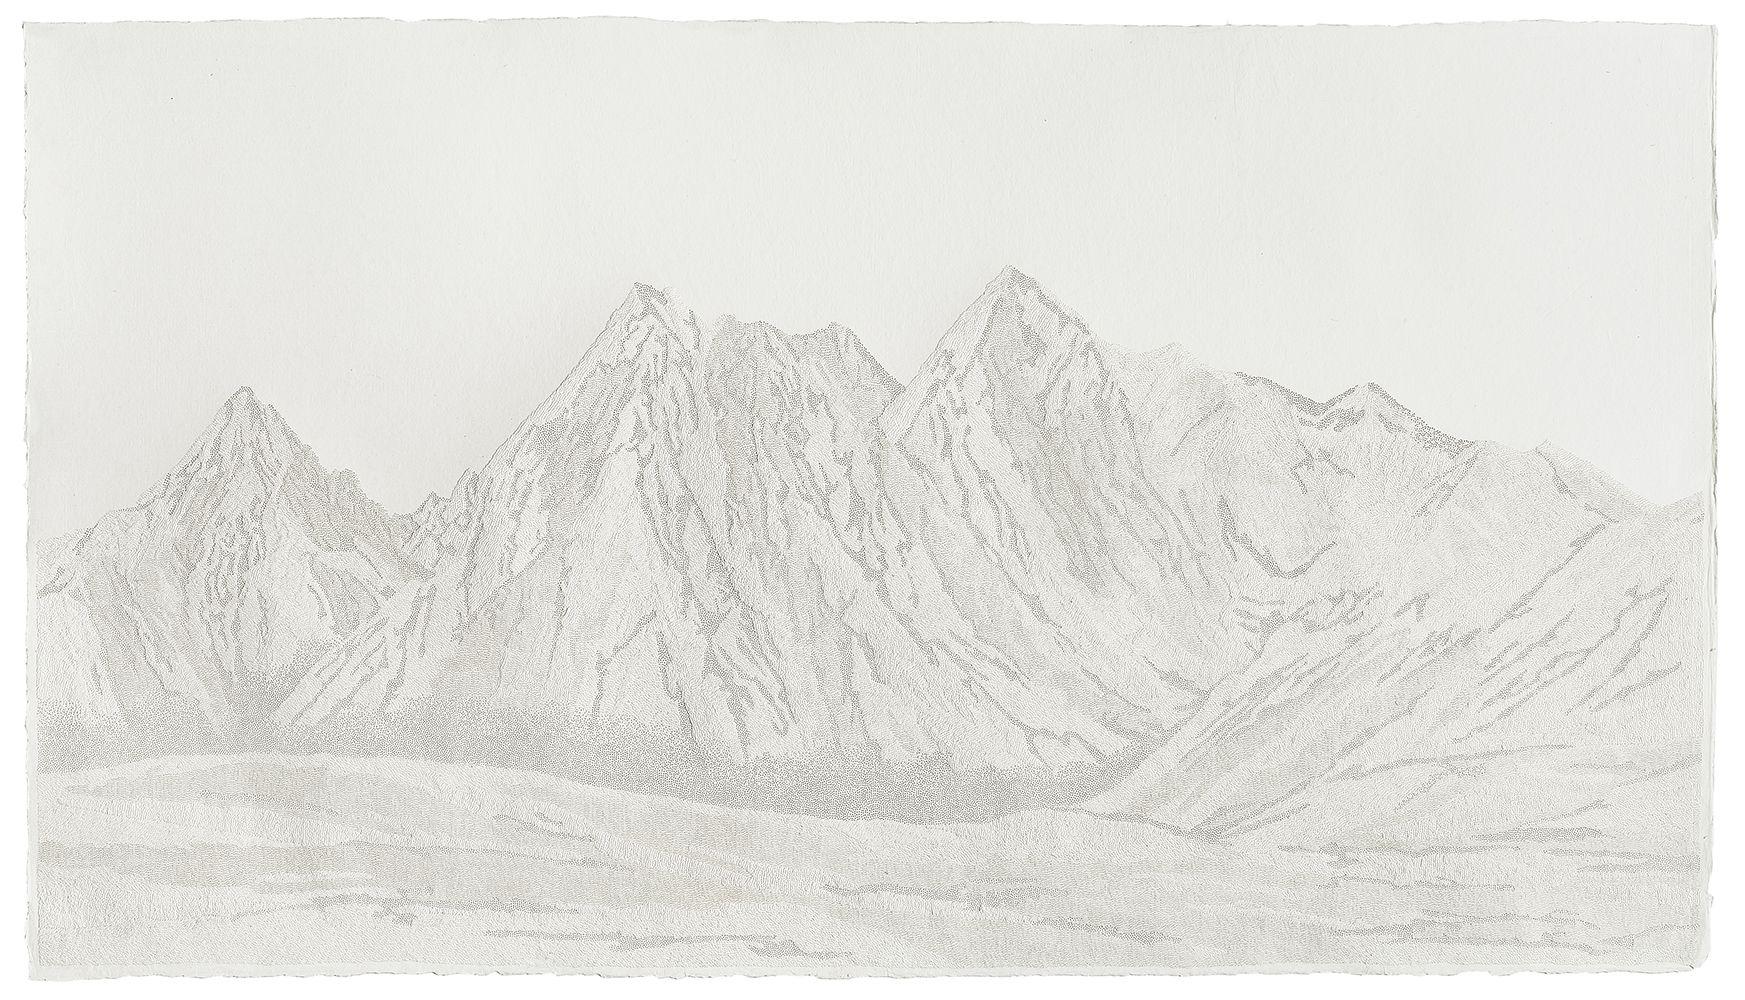 Fu Xiaotong 付小桐 (b. 1976), Mountain – 341,320 Pinpricks 341,320 孔之山, 2015